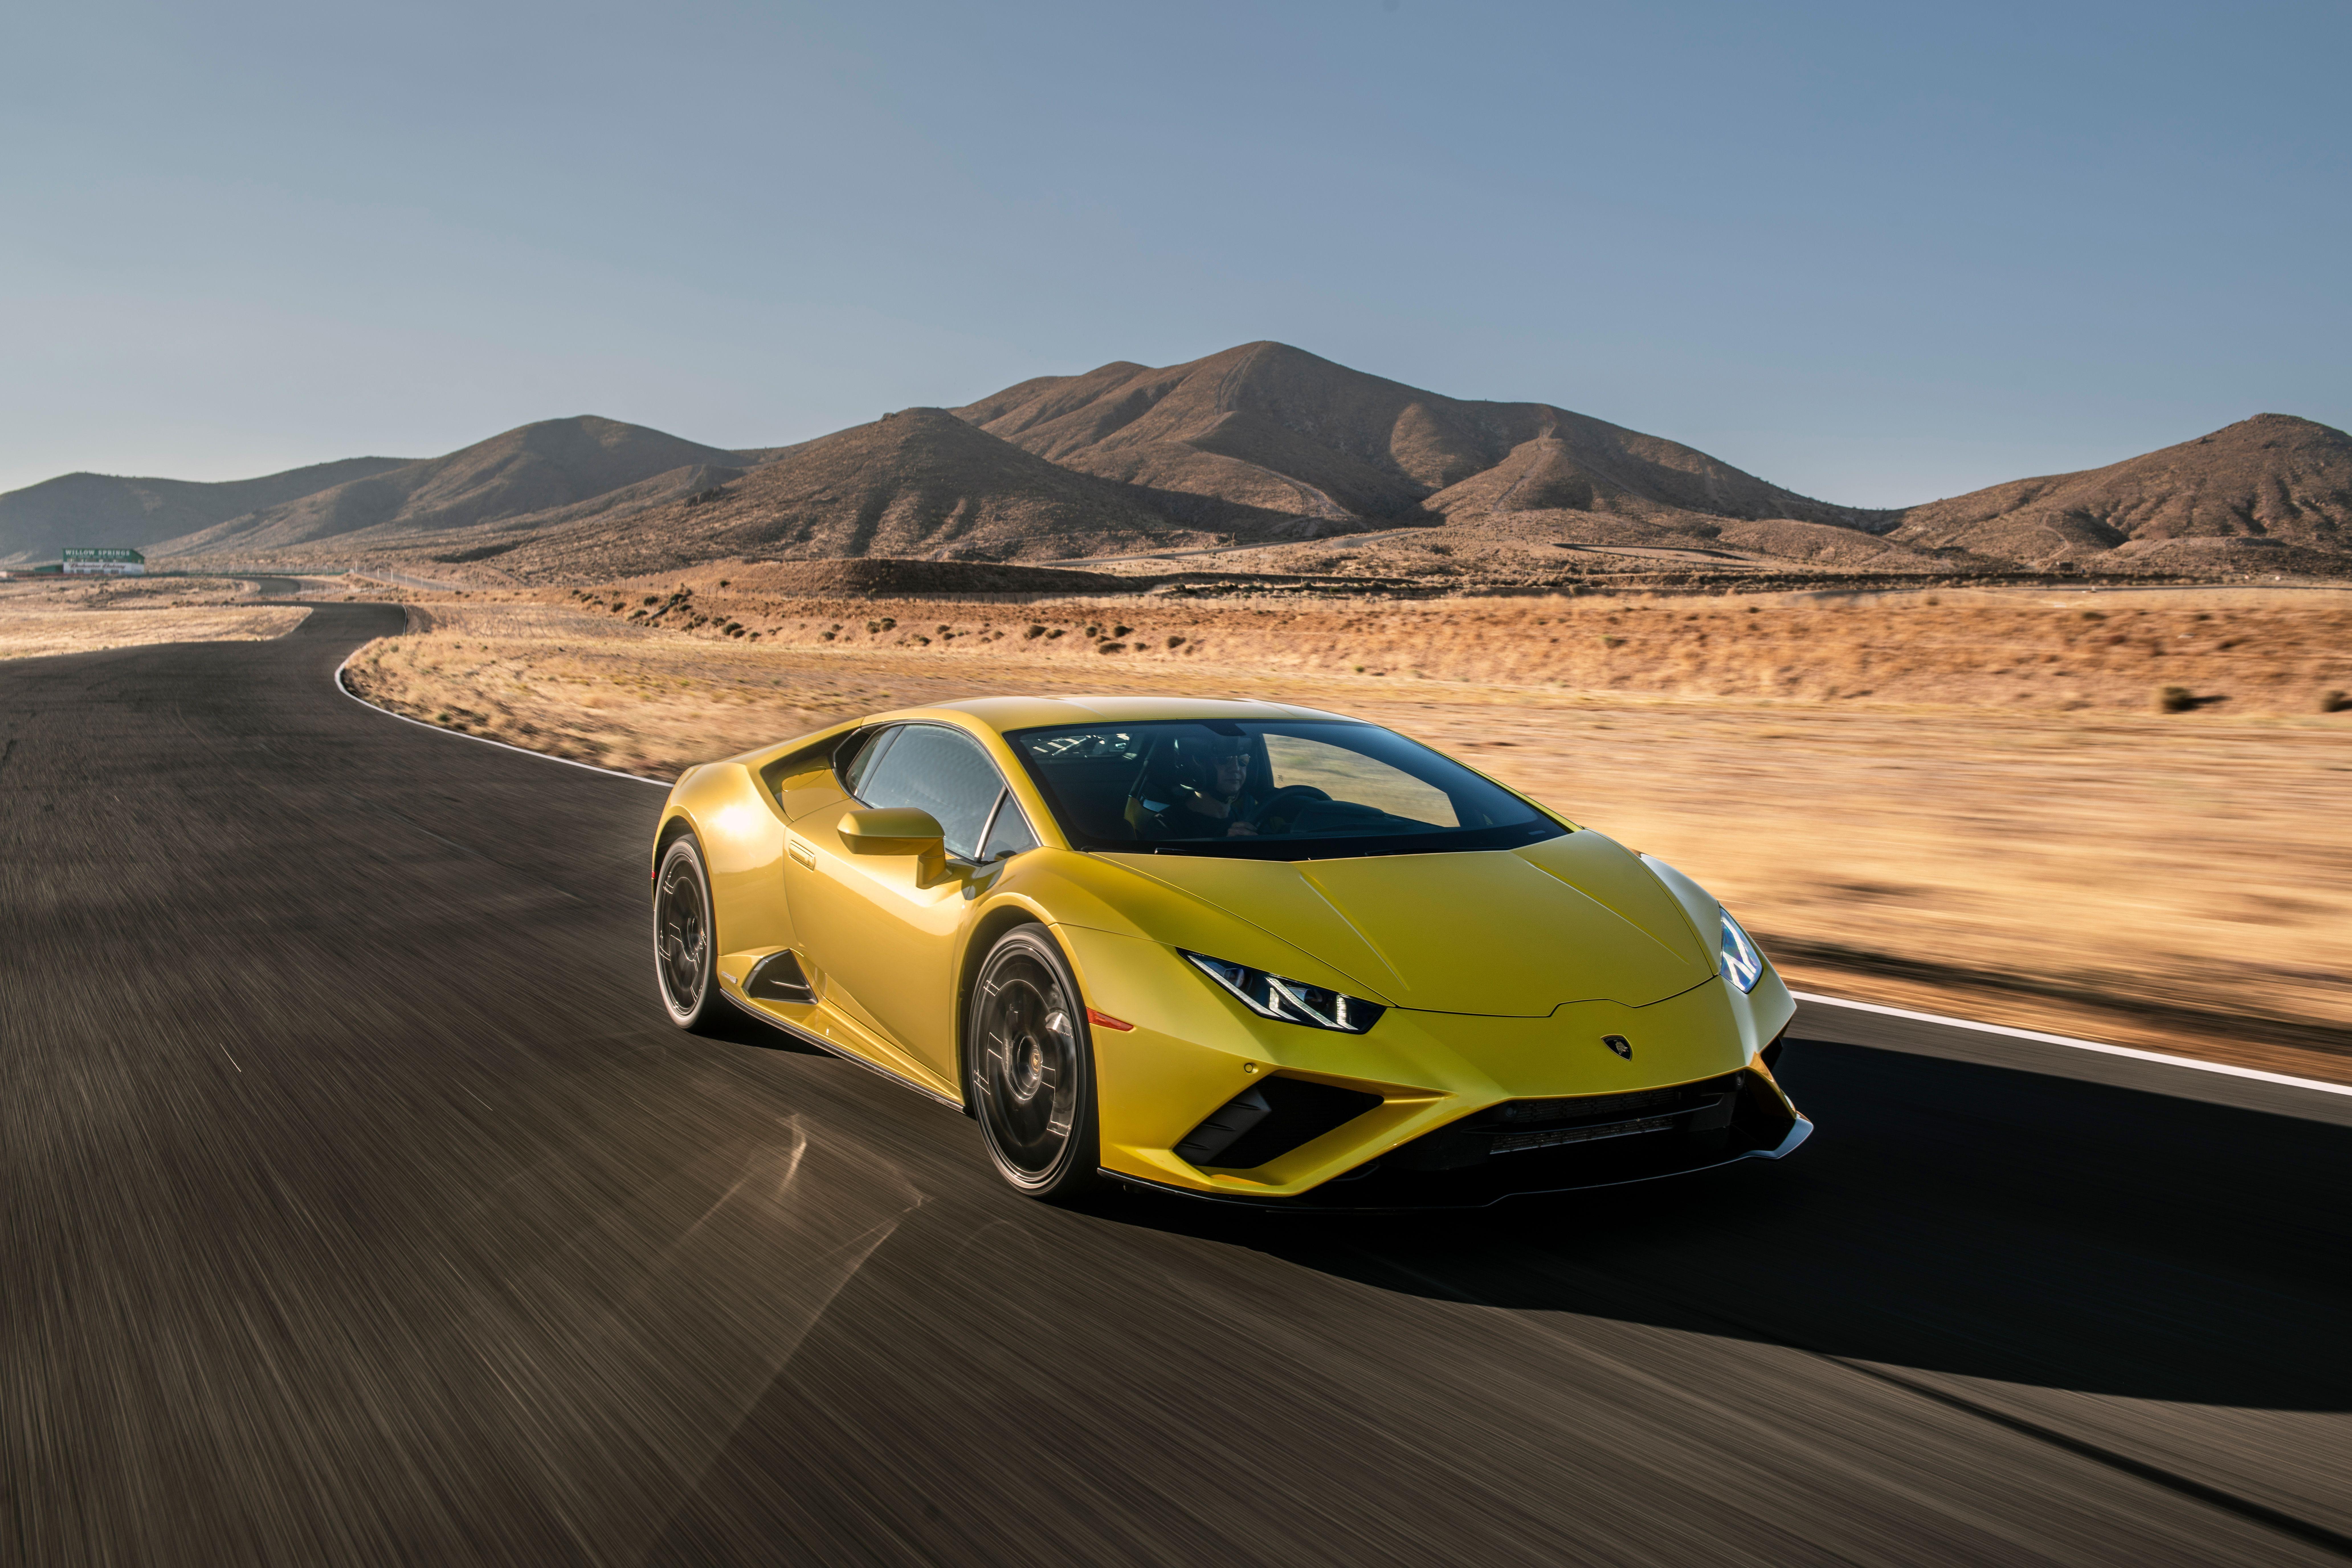 Lamborghini Huracan Evo 2021 4k Lamborghini Huracan Evo 2021 4k Wallpapers In 2021 Lamborghini Huracan Evo Lamborghini